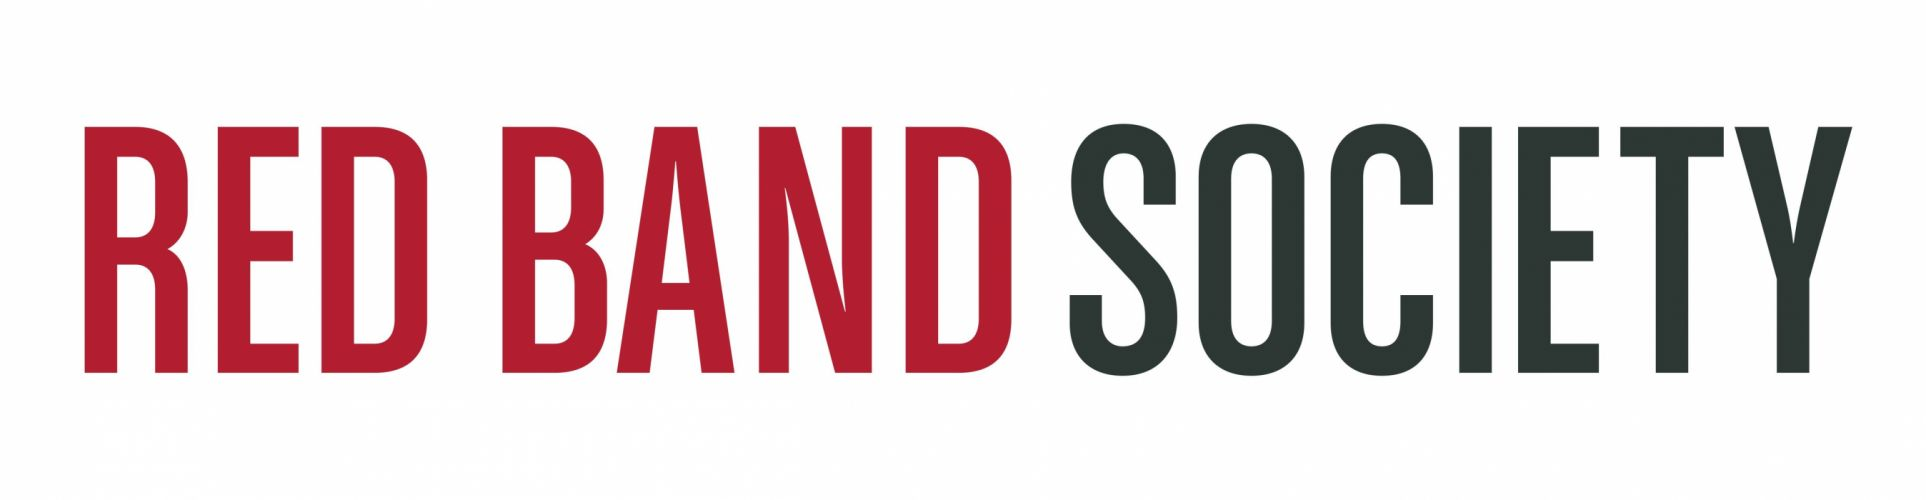 RED BAND SOCIETY drama medical series sitcom comedy rbs wallpaper